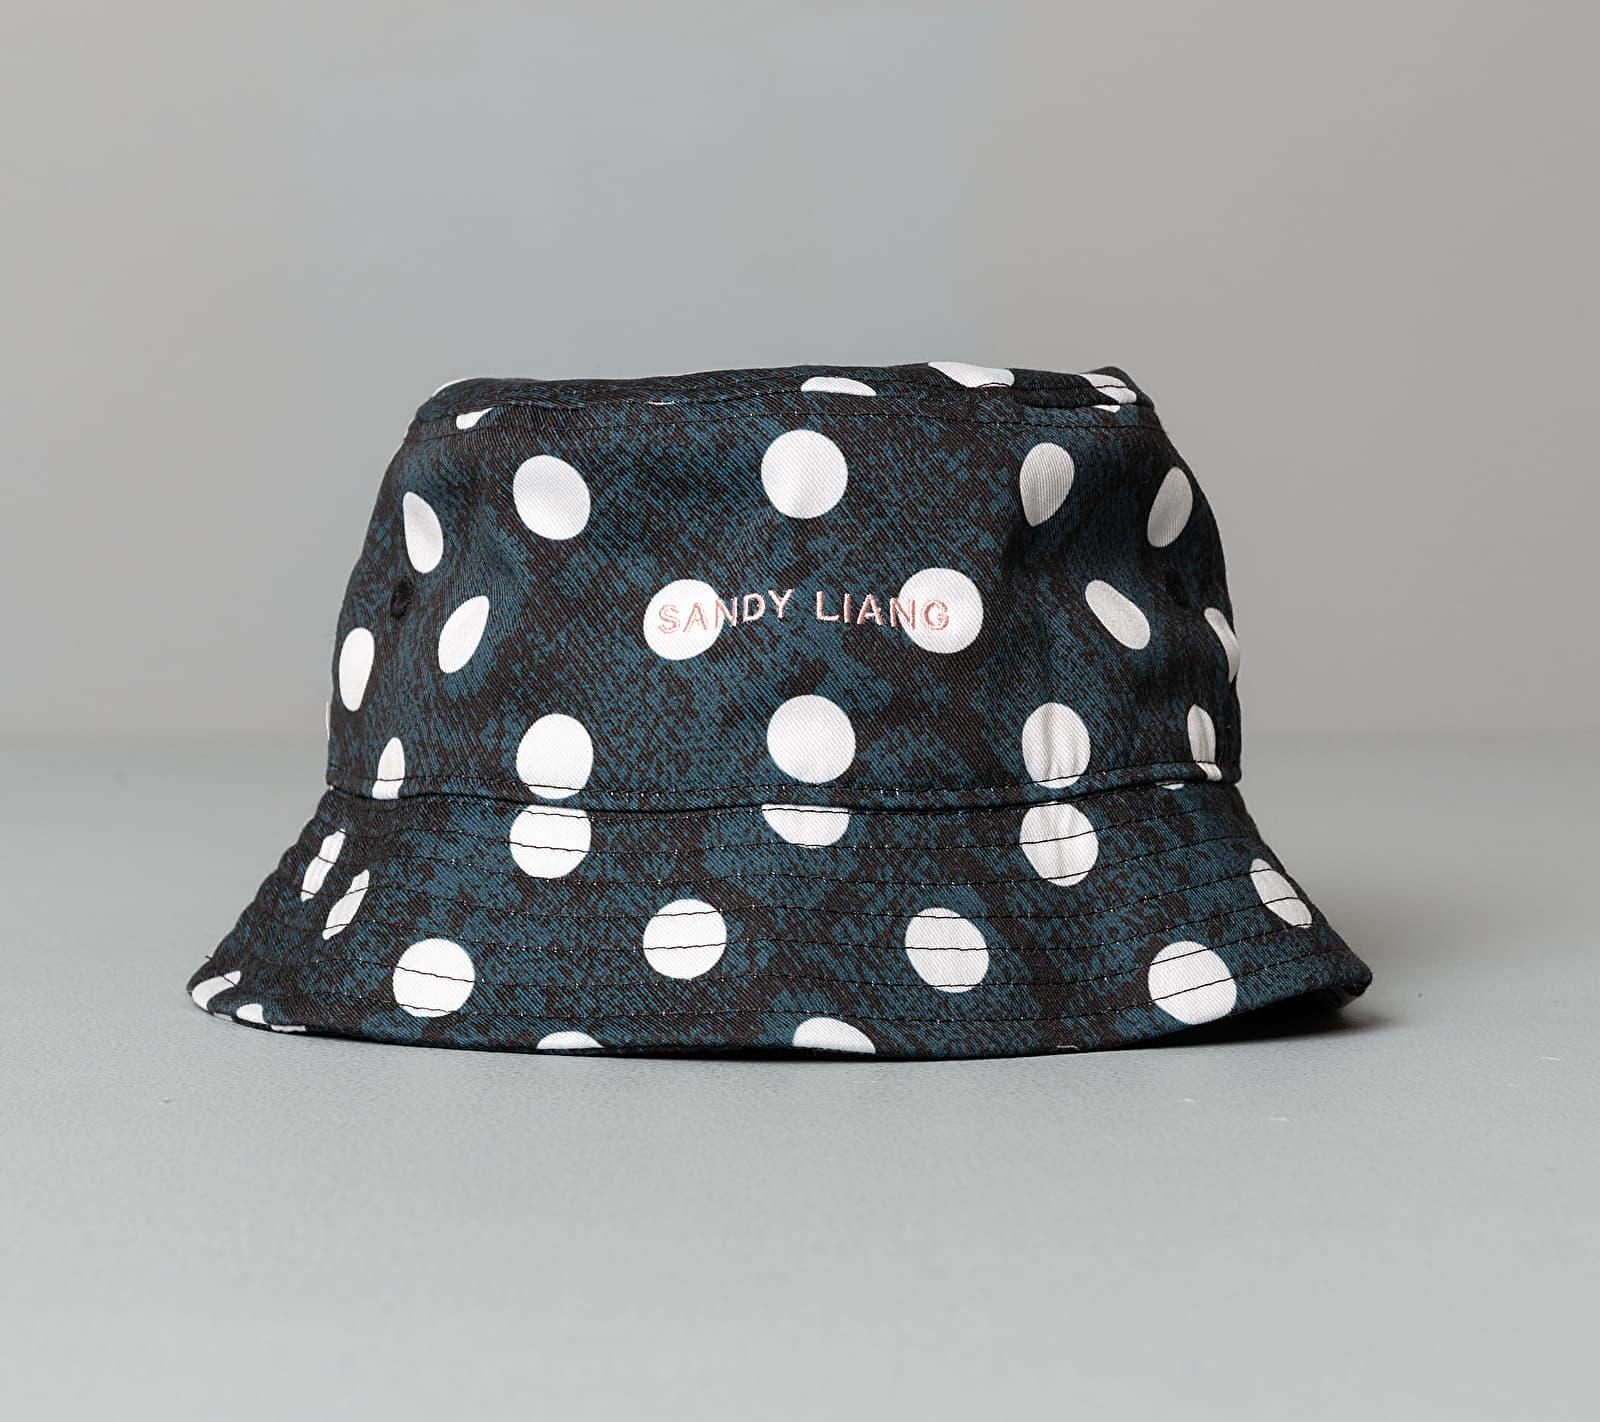 Vans x Sandy Liang Bucket Hat Midnight Navy, Blue